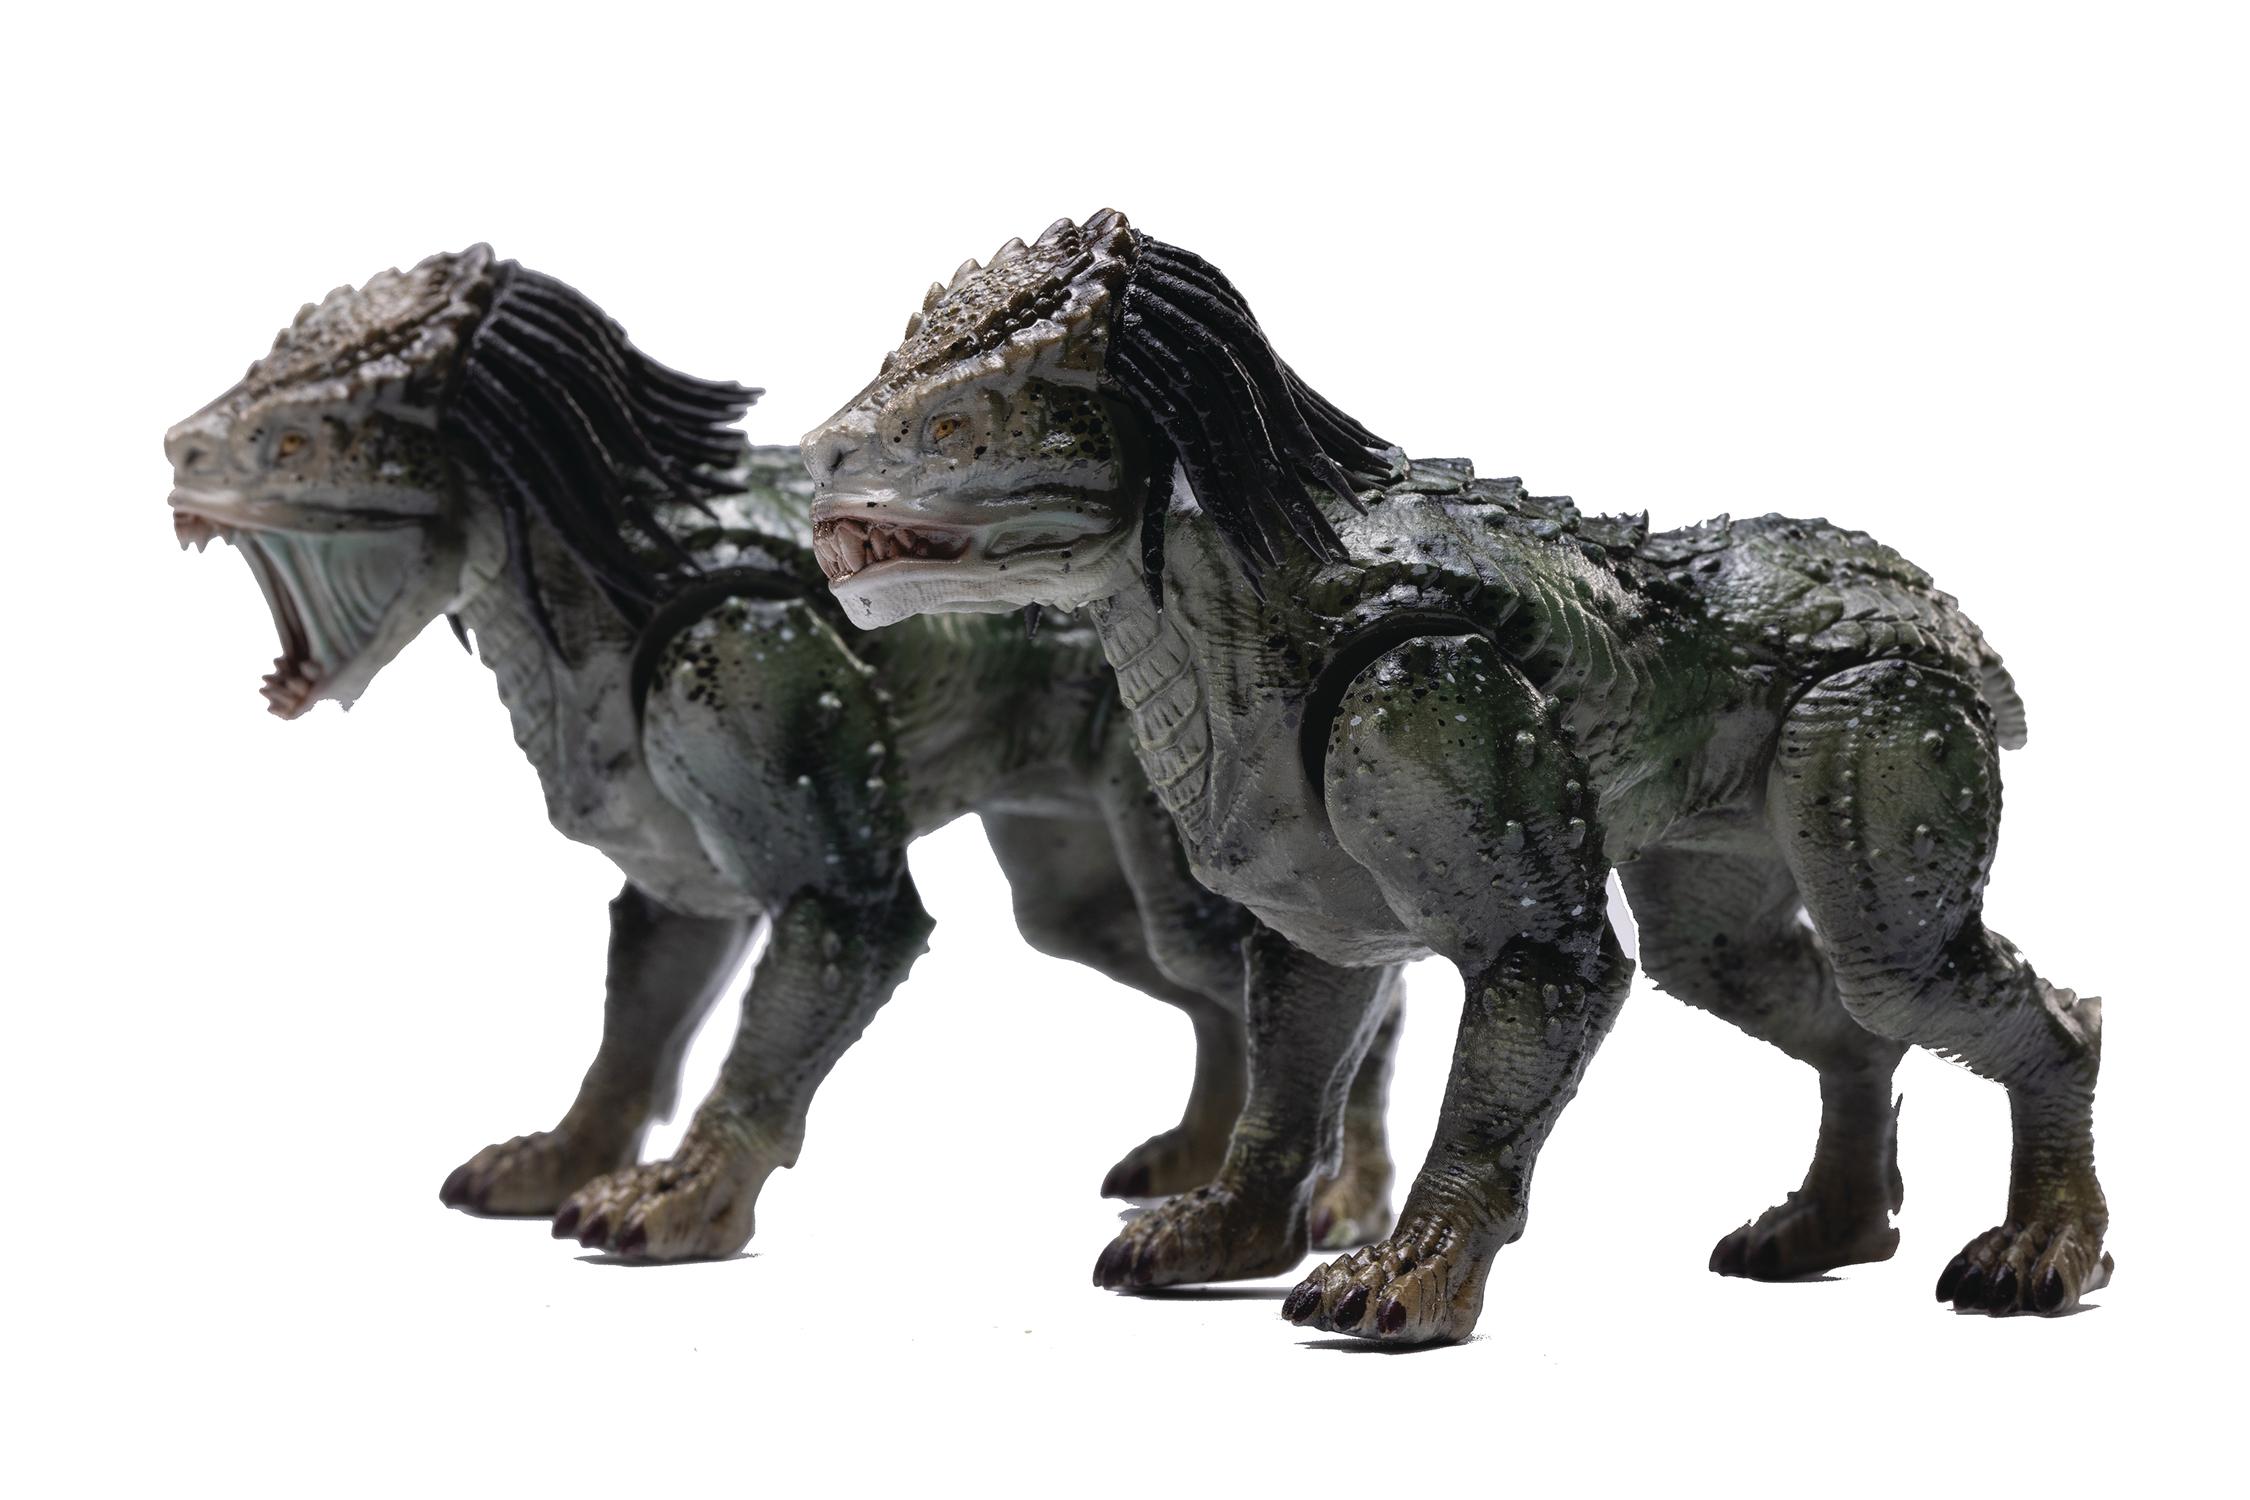 04-Predator-hound.jpg